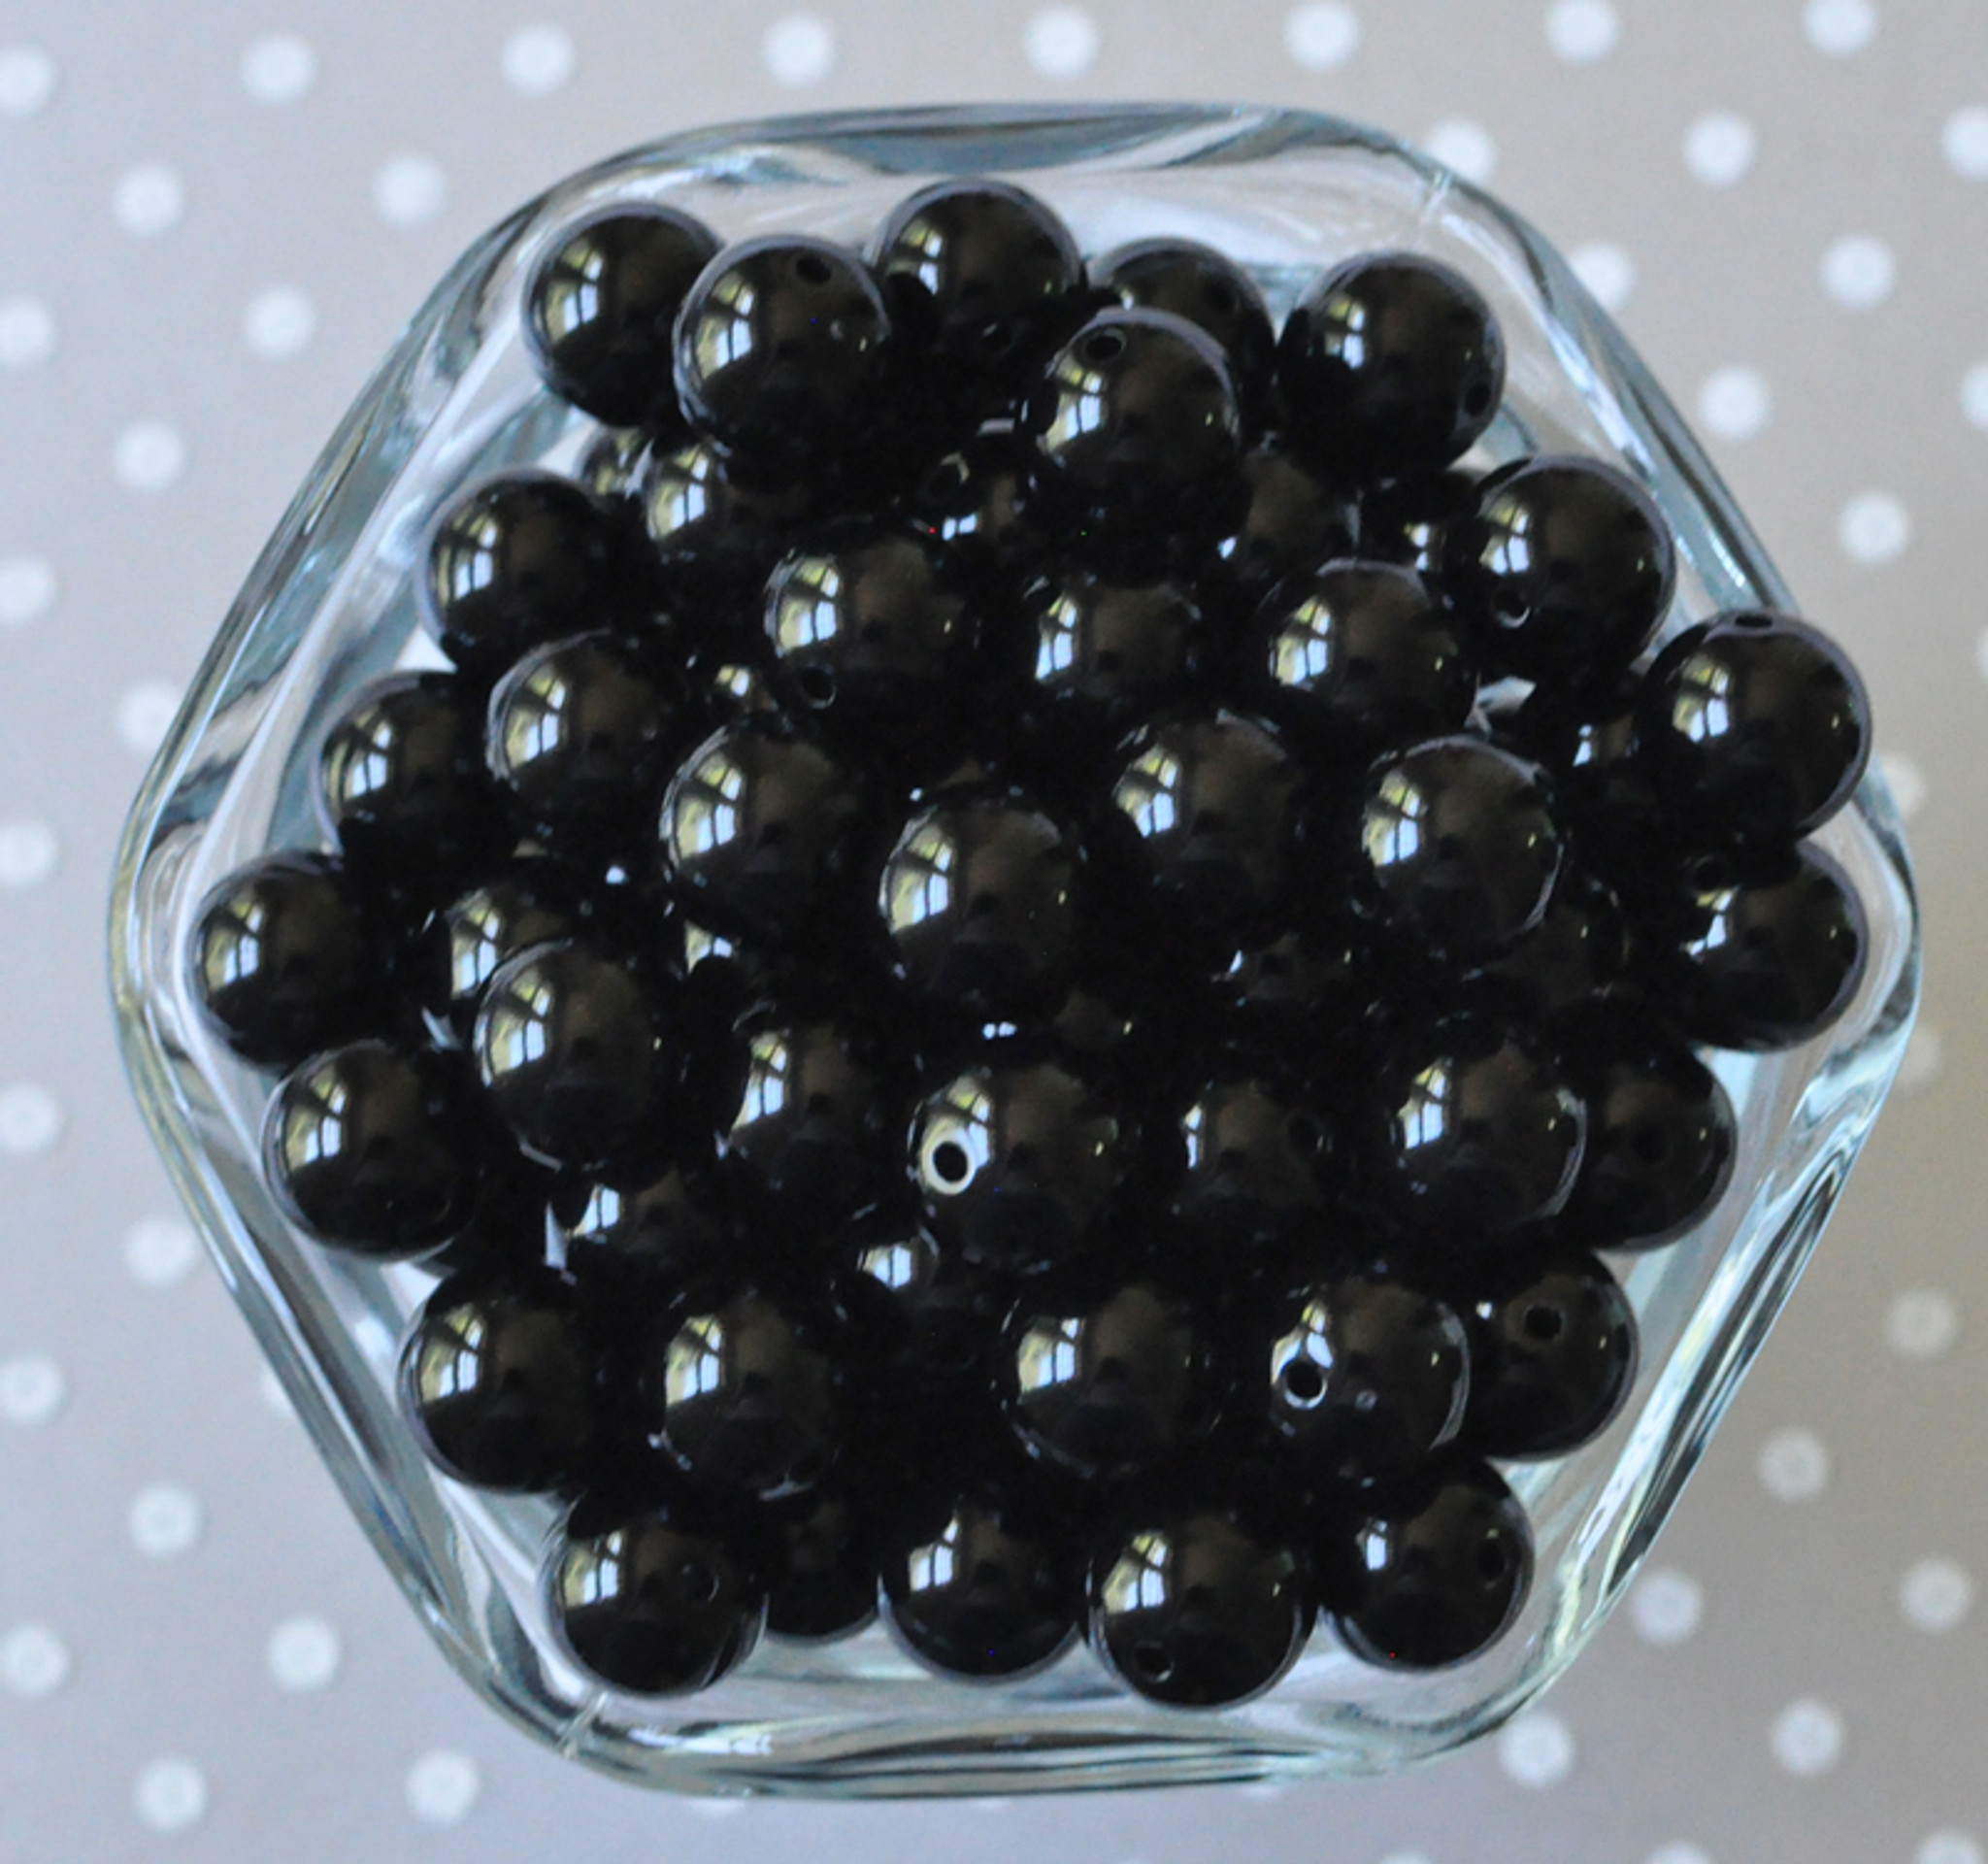 12mm Black solid small bubblegum beads